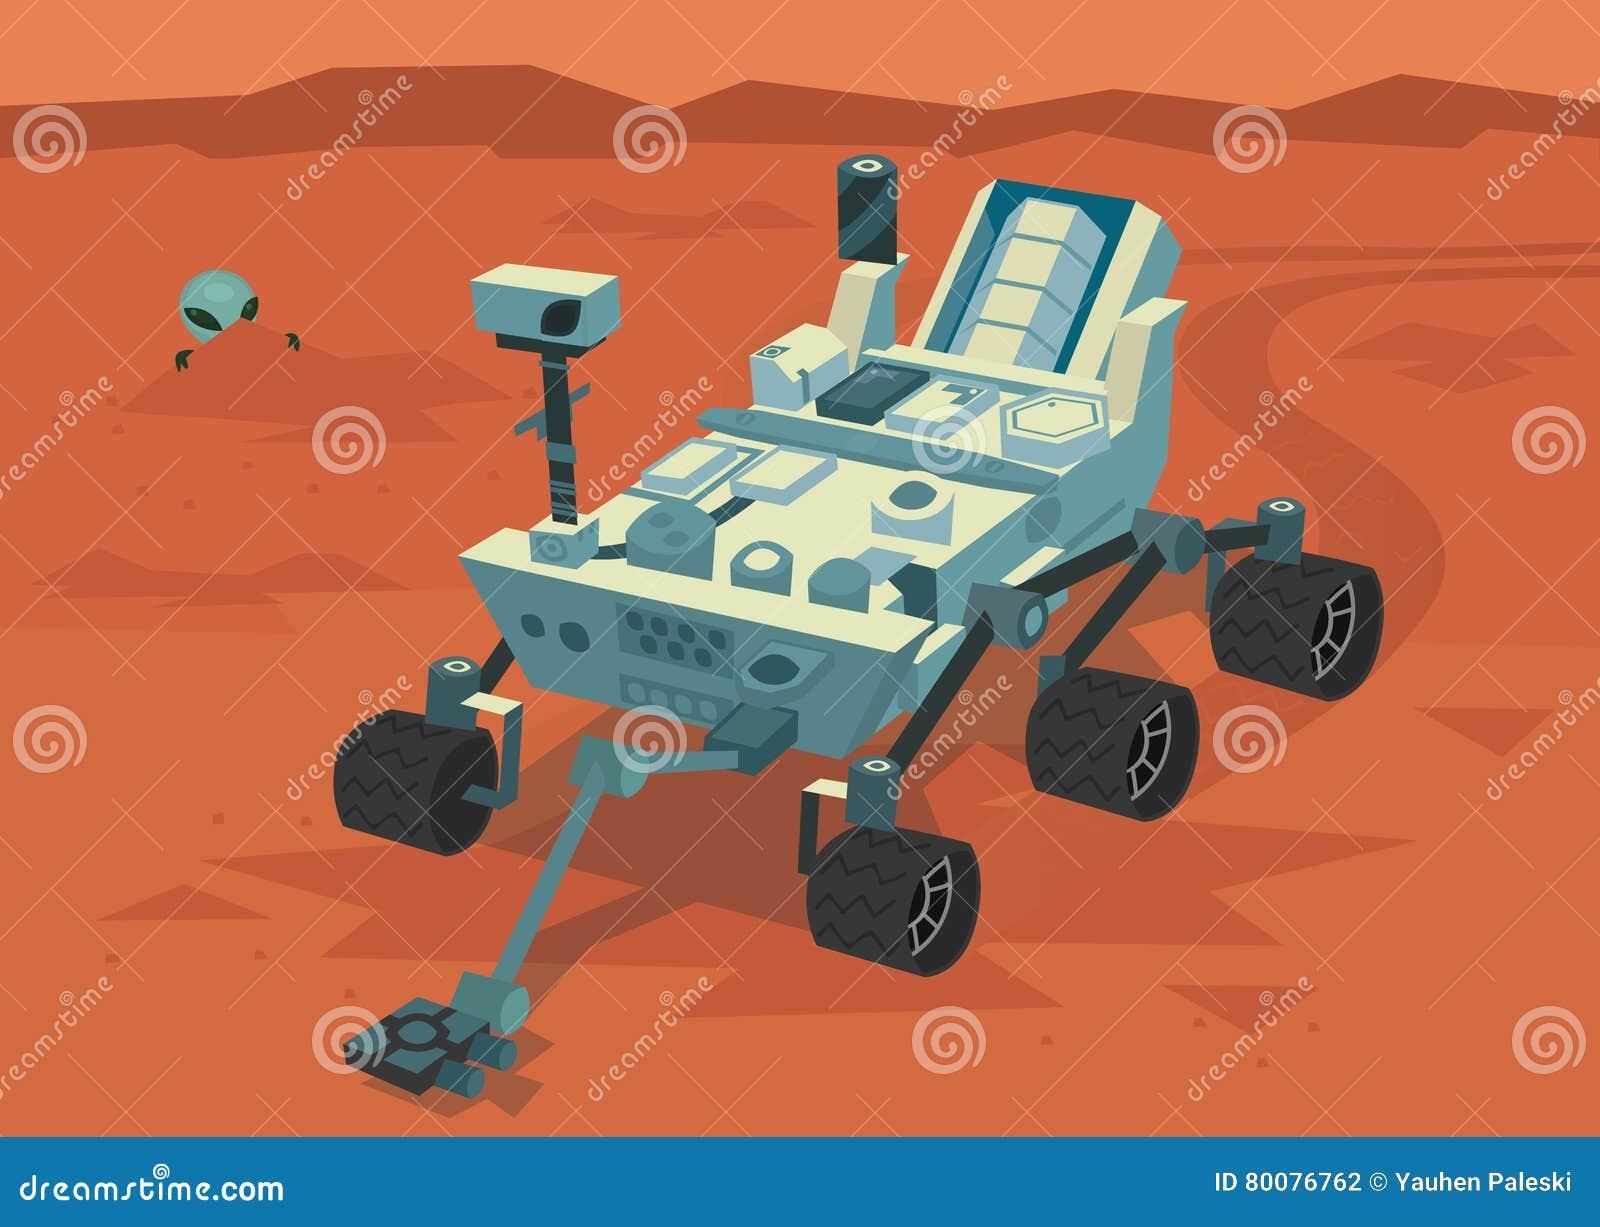 mars rover vector - photo #9